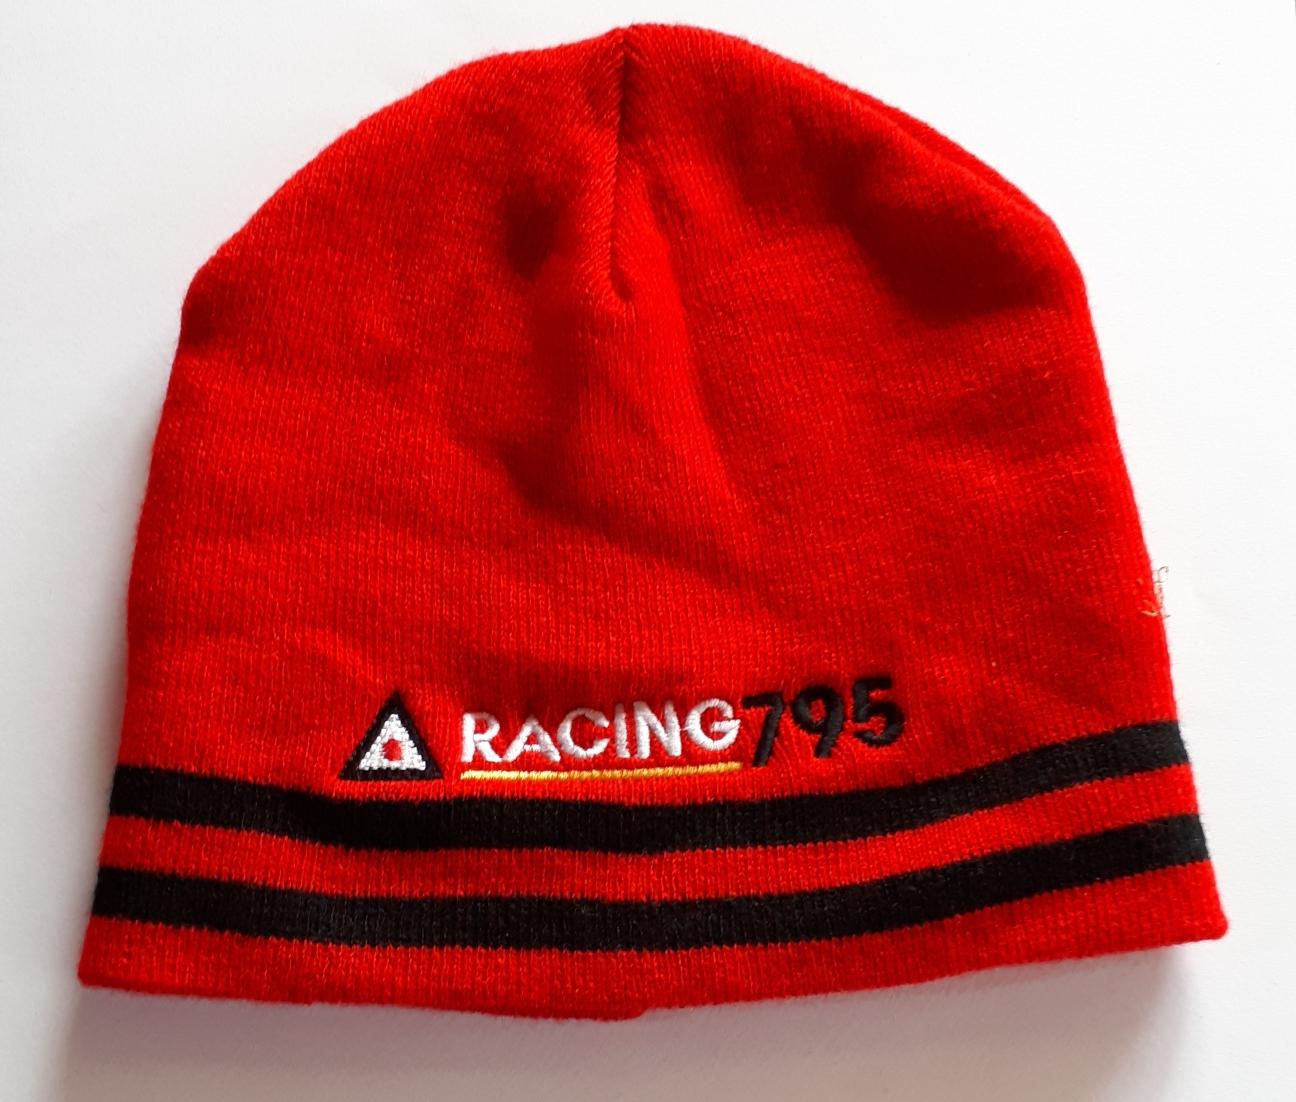 Racing 795 Beanie